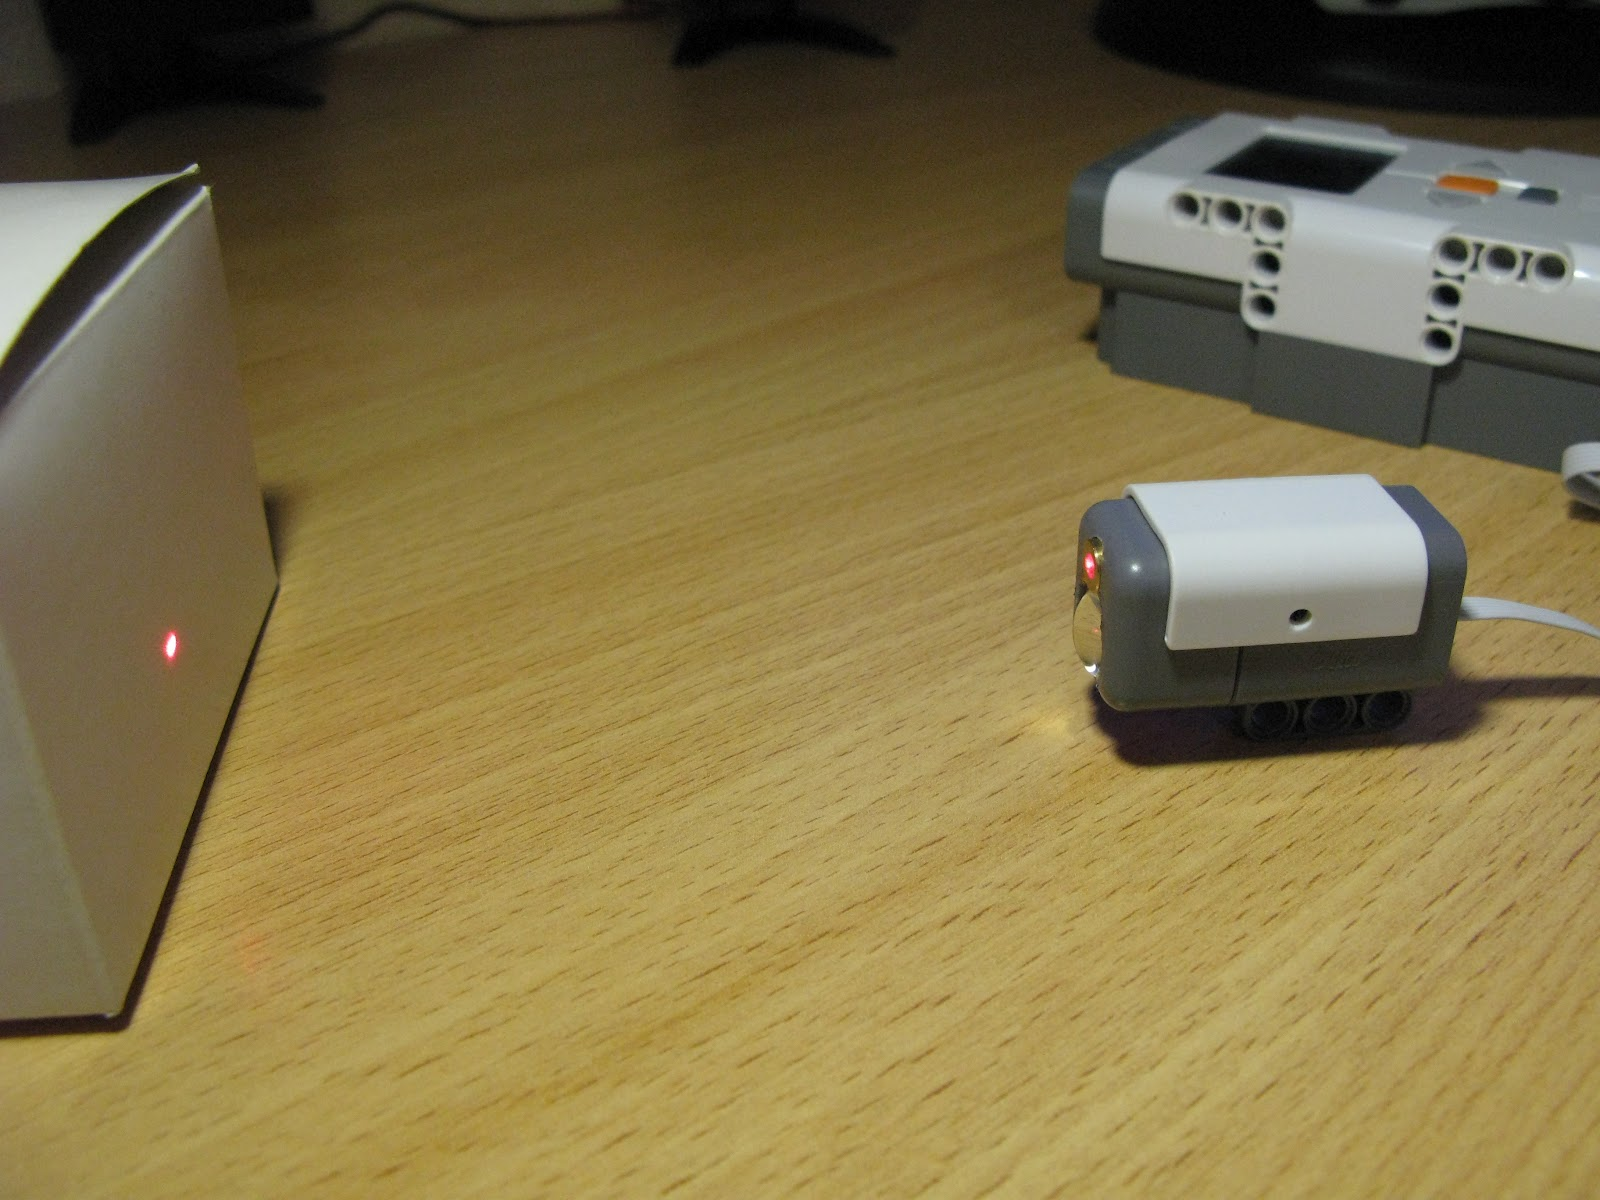 Camera Lego Nxt : Nxt laser sensor for lego nxt